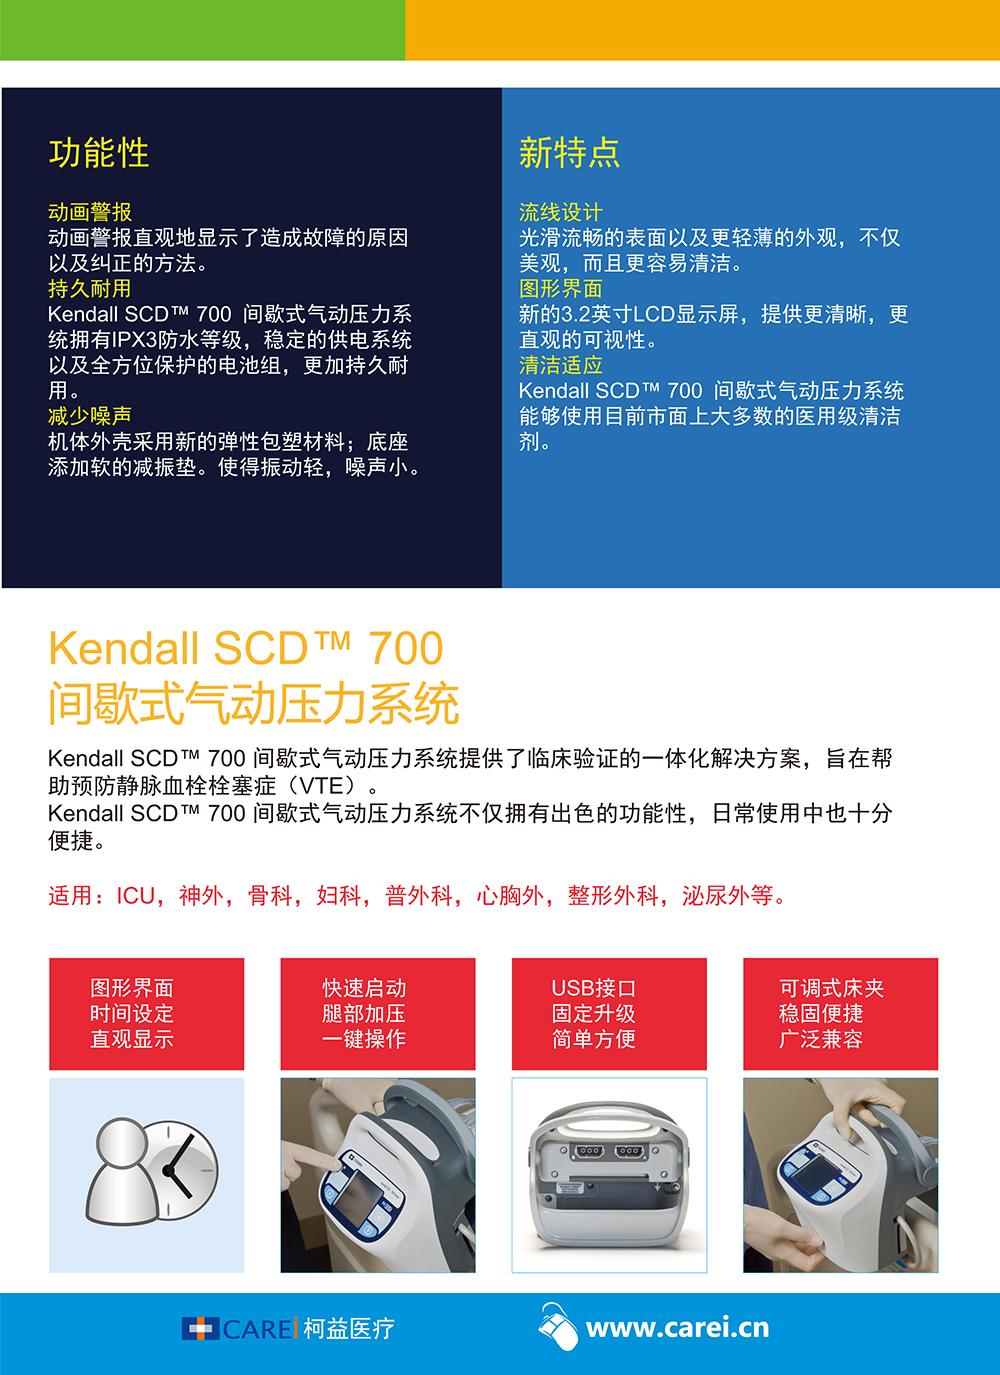 kendall-scd-700-series-controller-f3.jpg